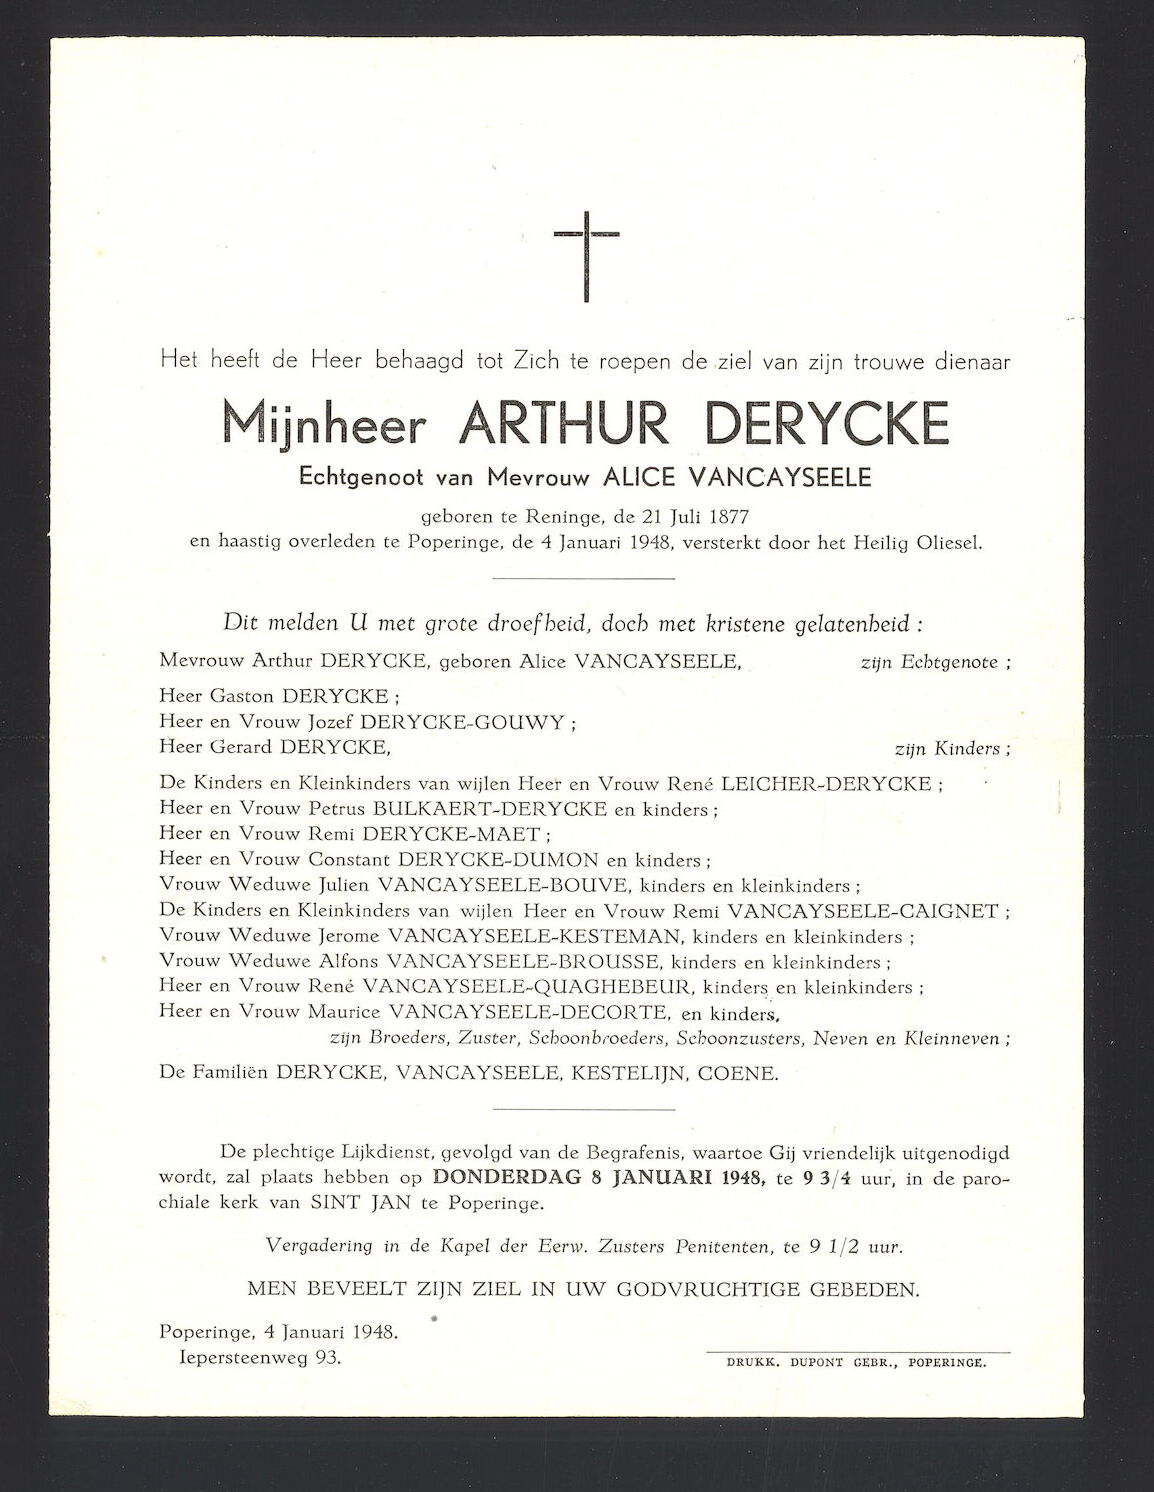 Arthur Derycke